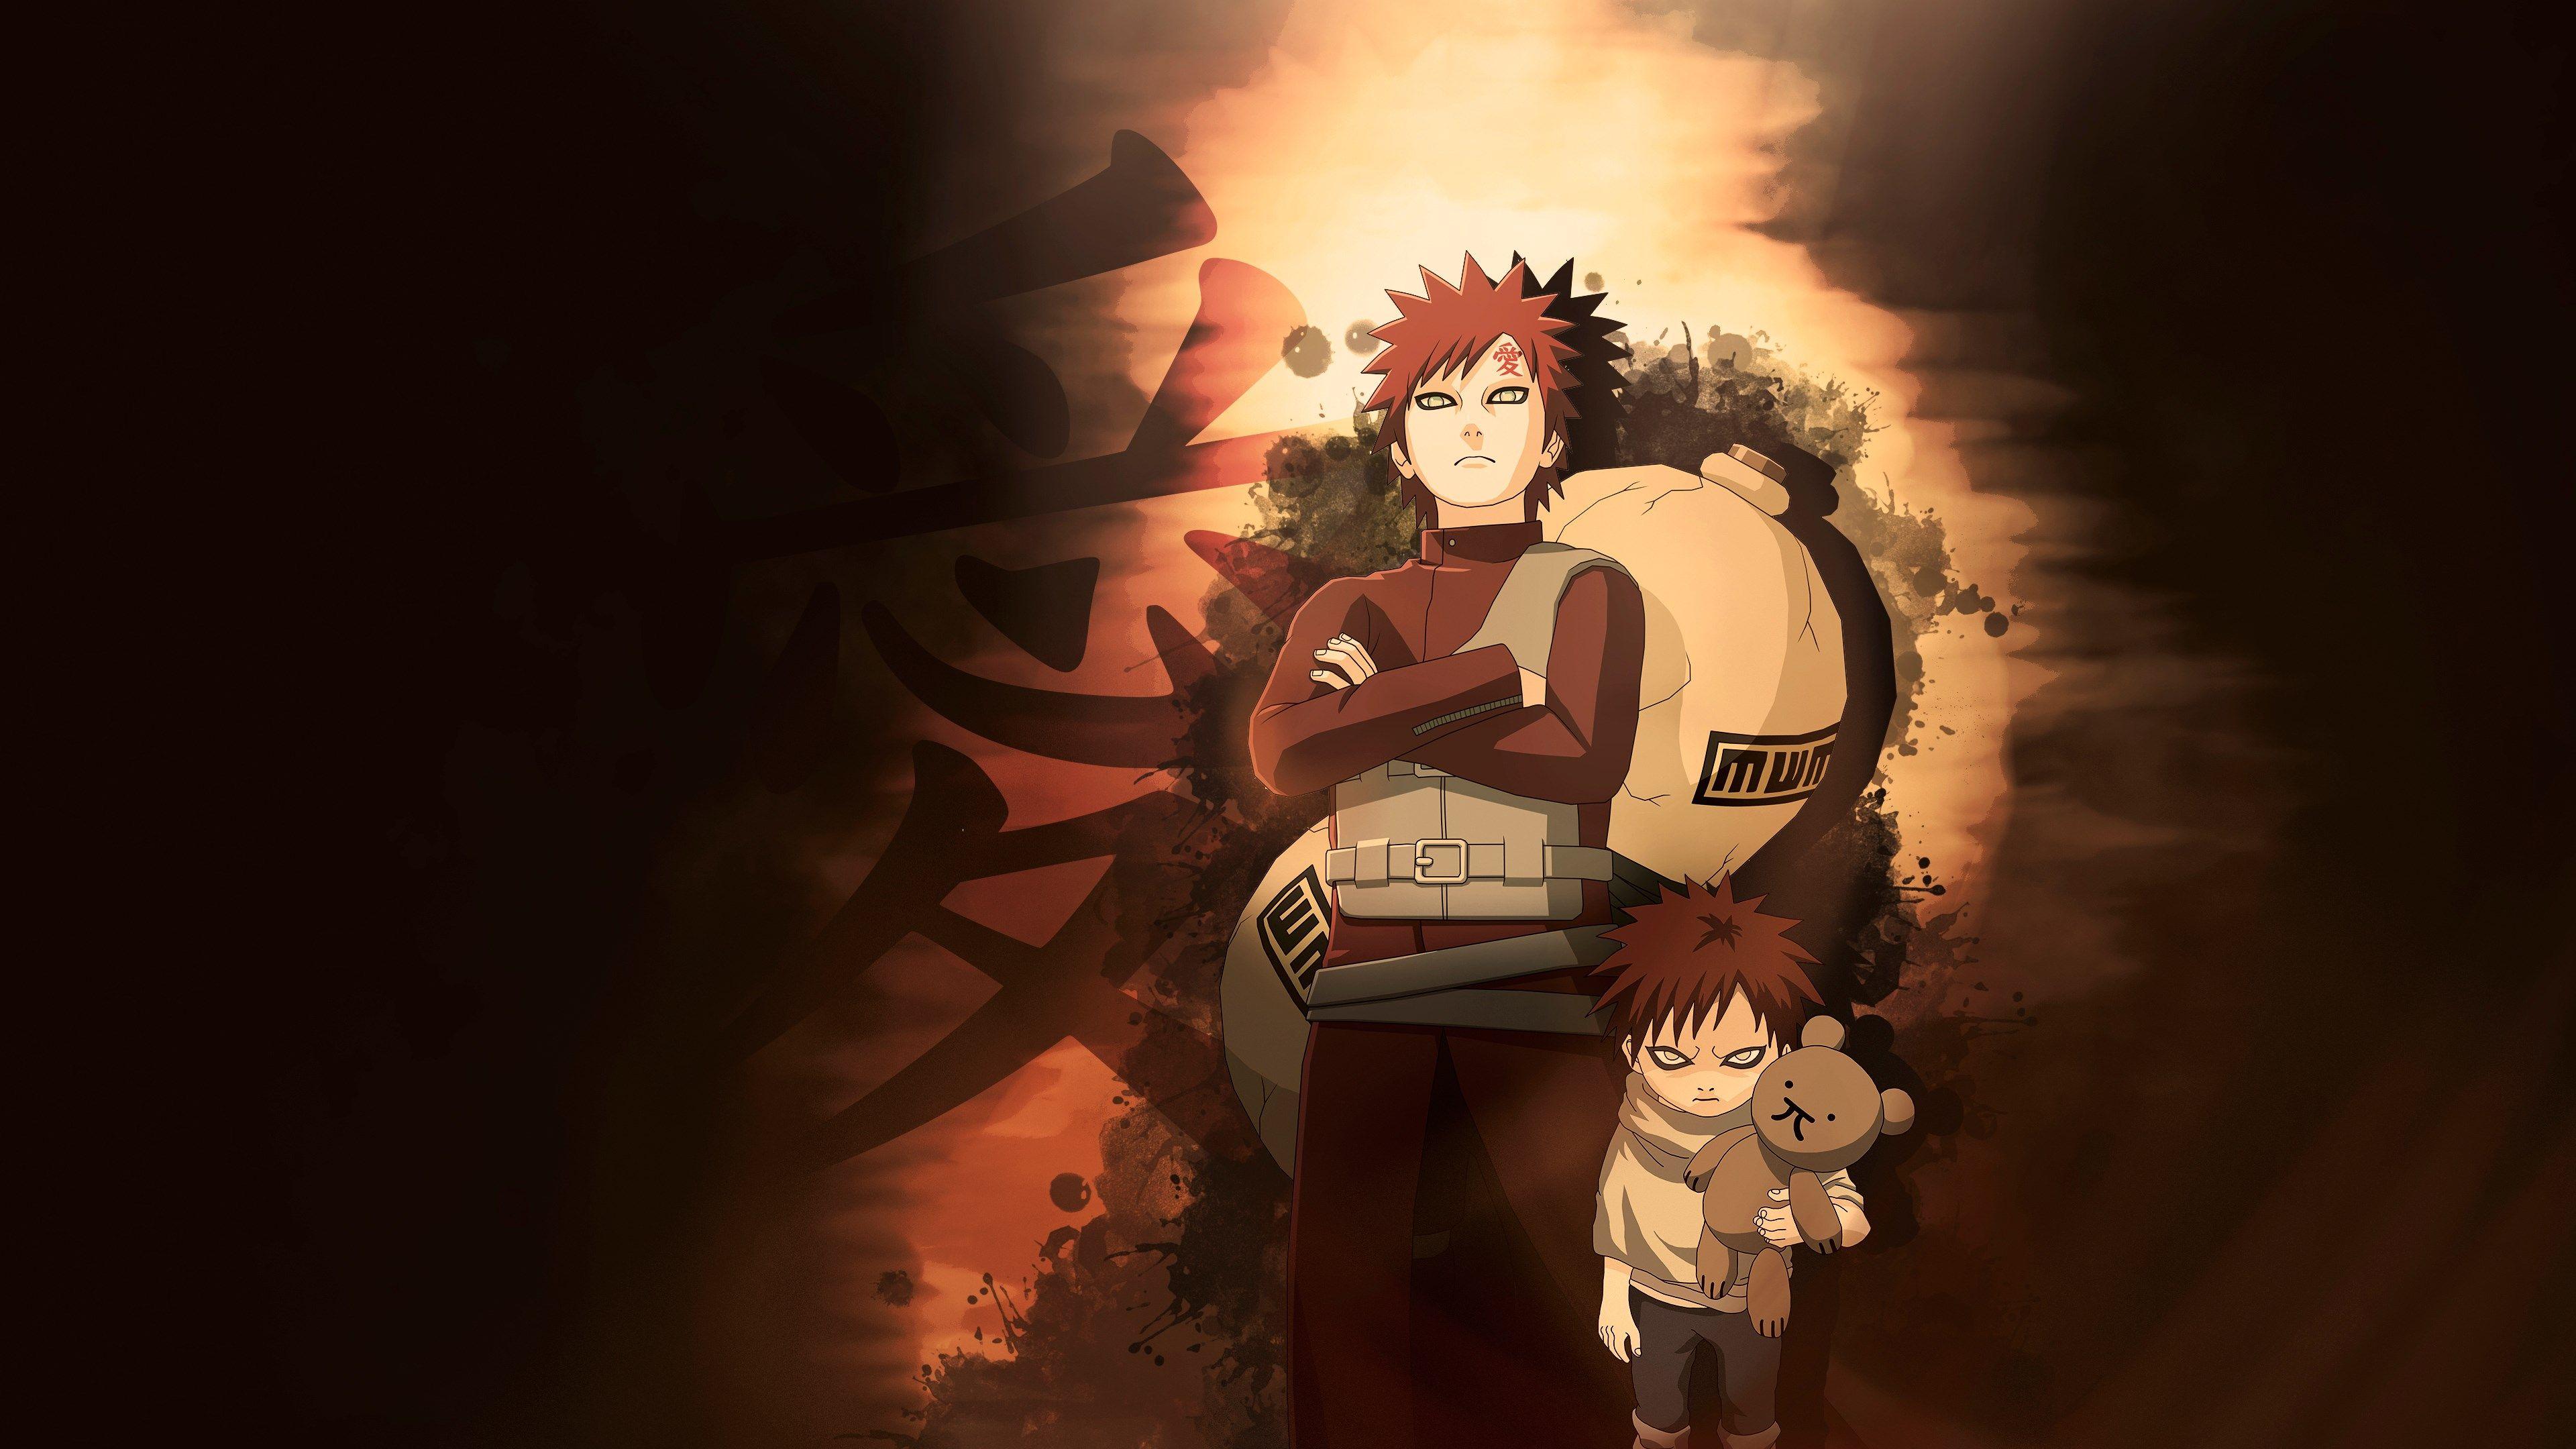 Cool Wallpaper Naruto High Resolution - 35f83965525ca1ab697a9c05cae79366  Photograph_866551.jpg